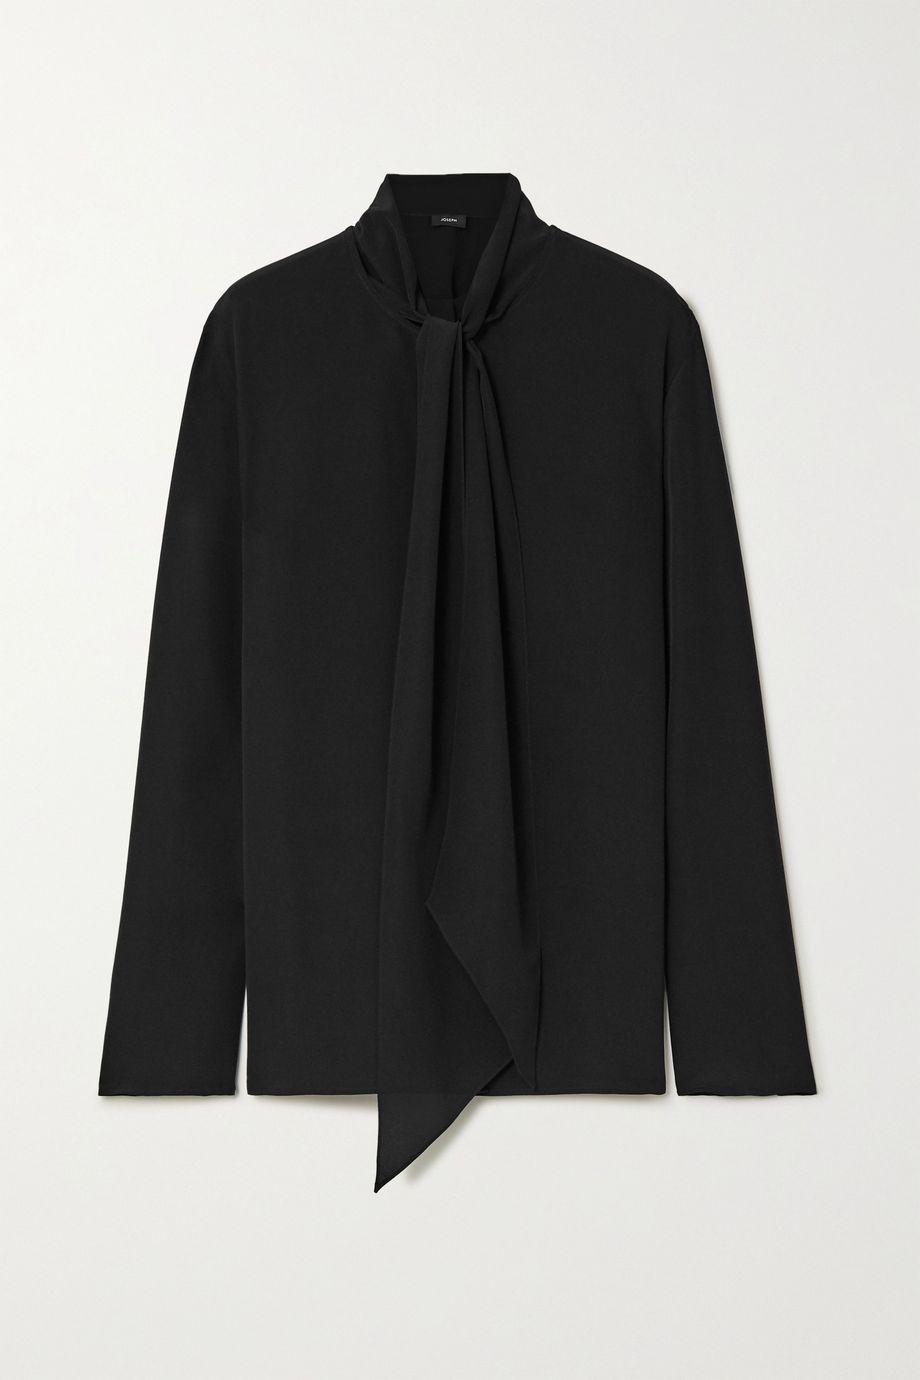 Joseph Branca pussy-bow silk crepe de chine blouse